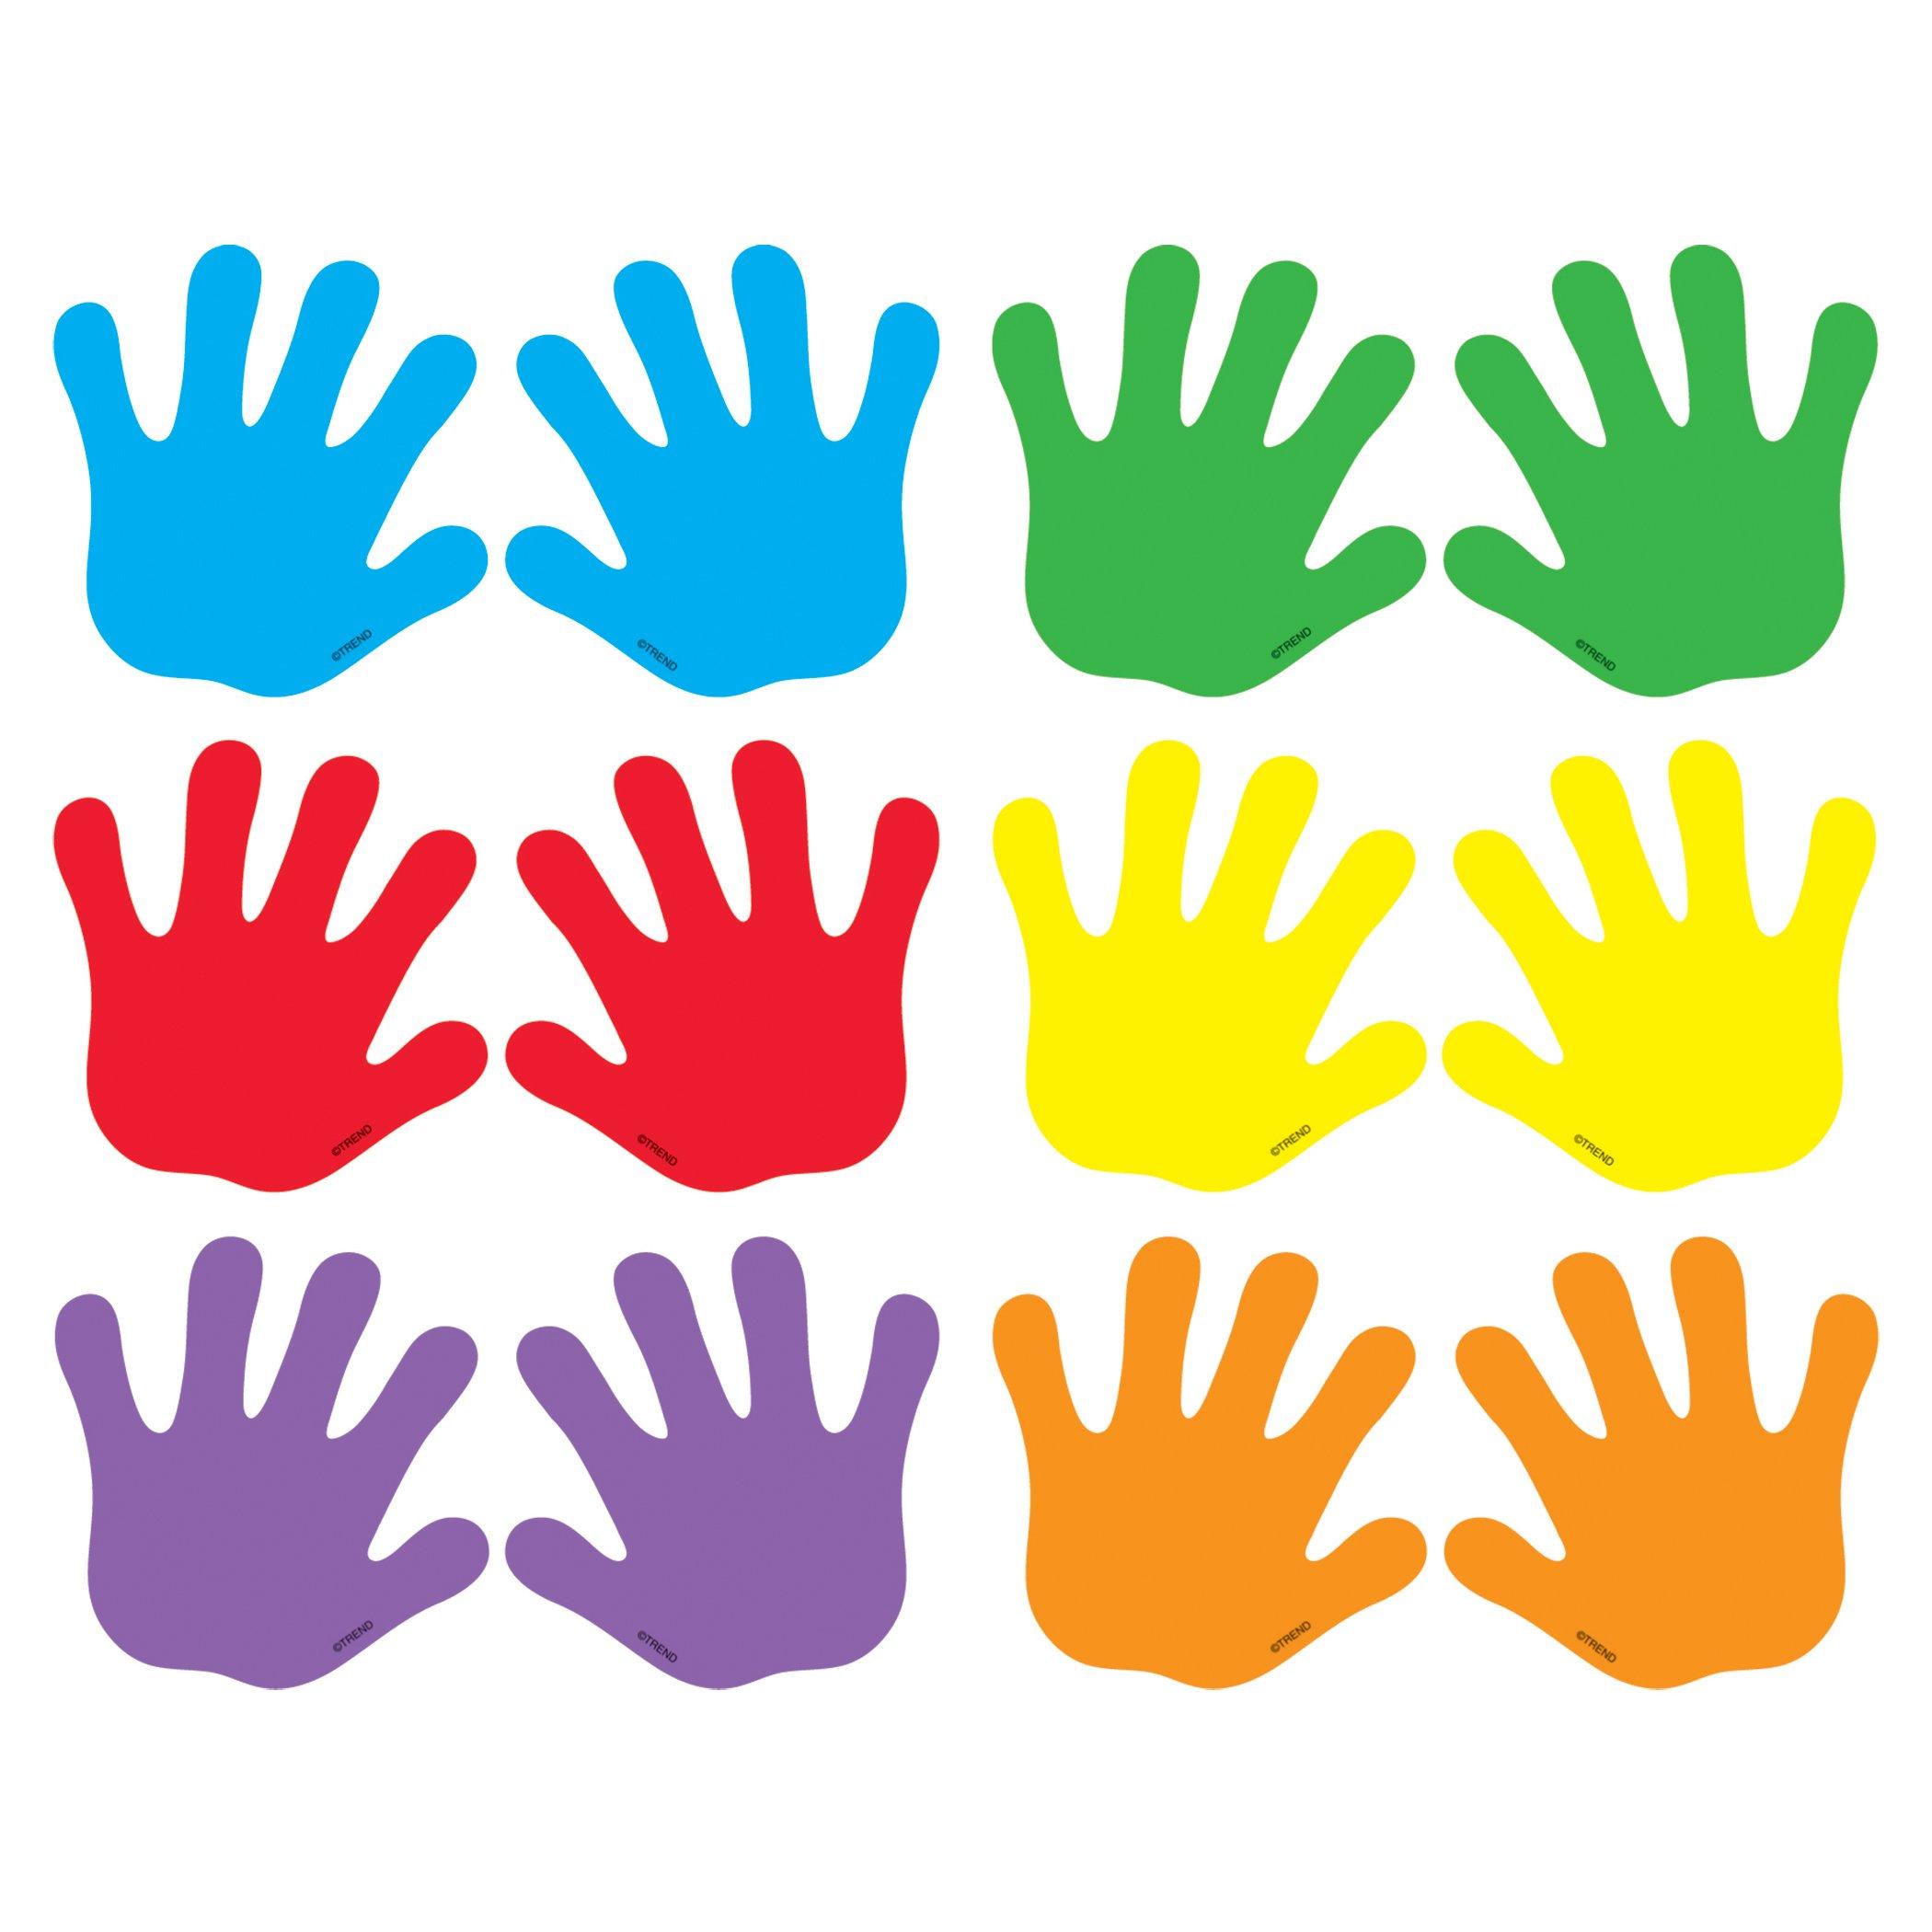 TREND enterprises, Inc. T-10831BN Handprints Mini Accents Variety Pack, 36 Per Pack, 6 Packs